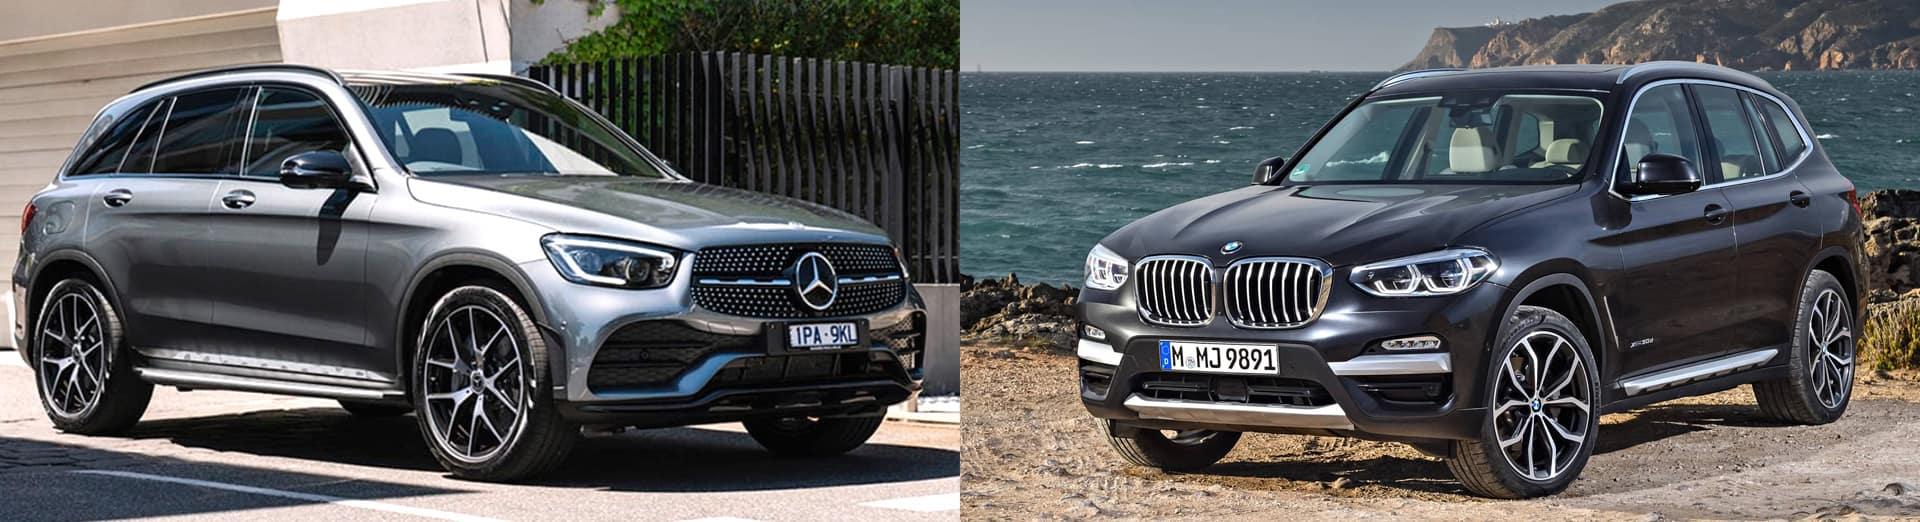 2020 GLC 300 goes head-to-head with the BMW X3